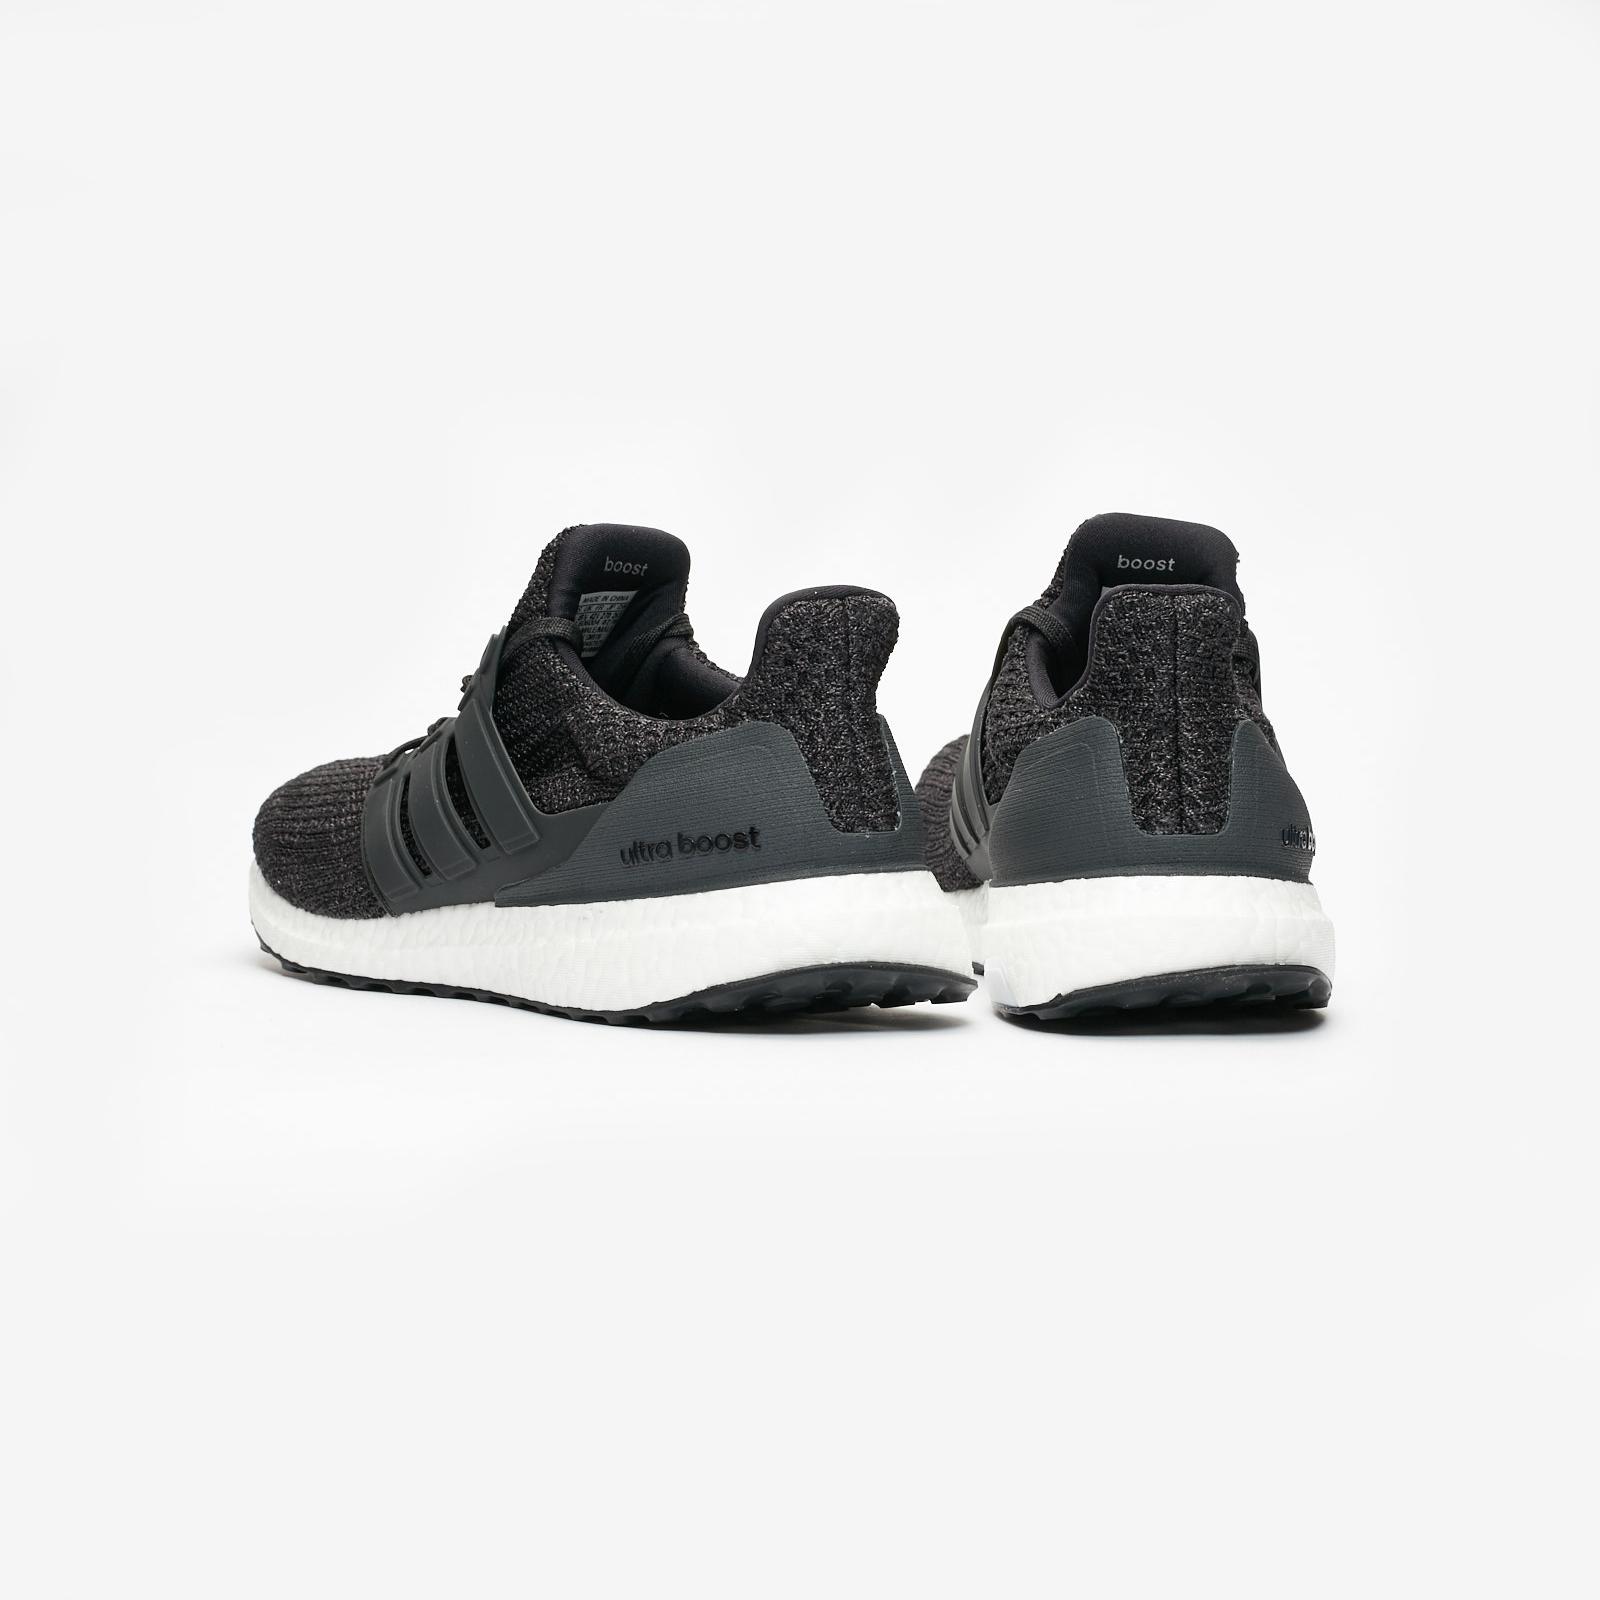 768b7bb4808 adidas Ultraboost - Cm8116 - Sneakersnstuff